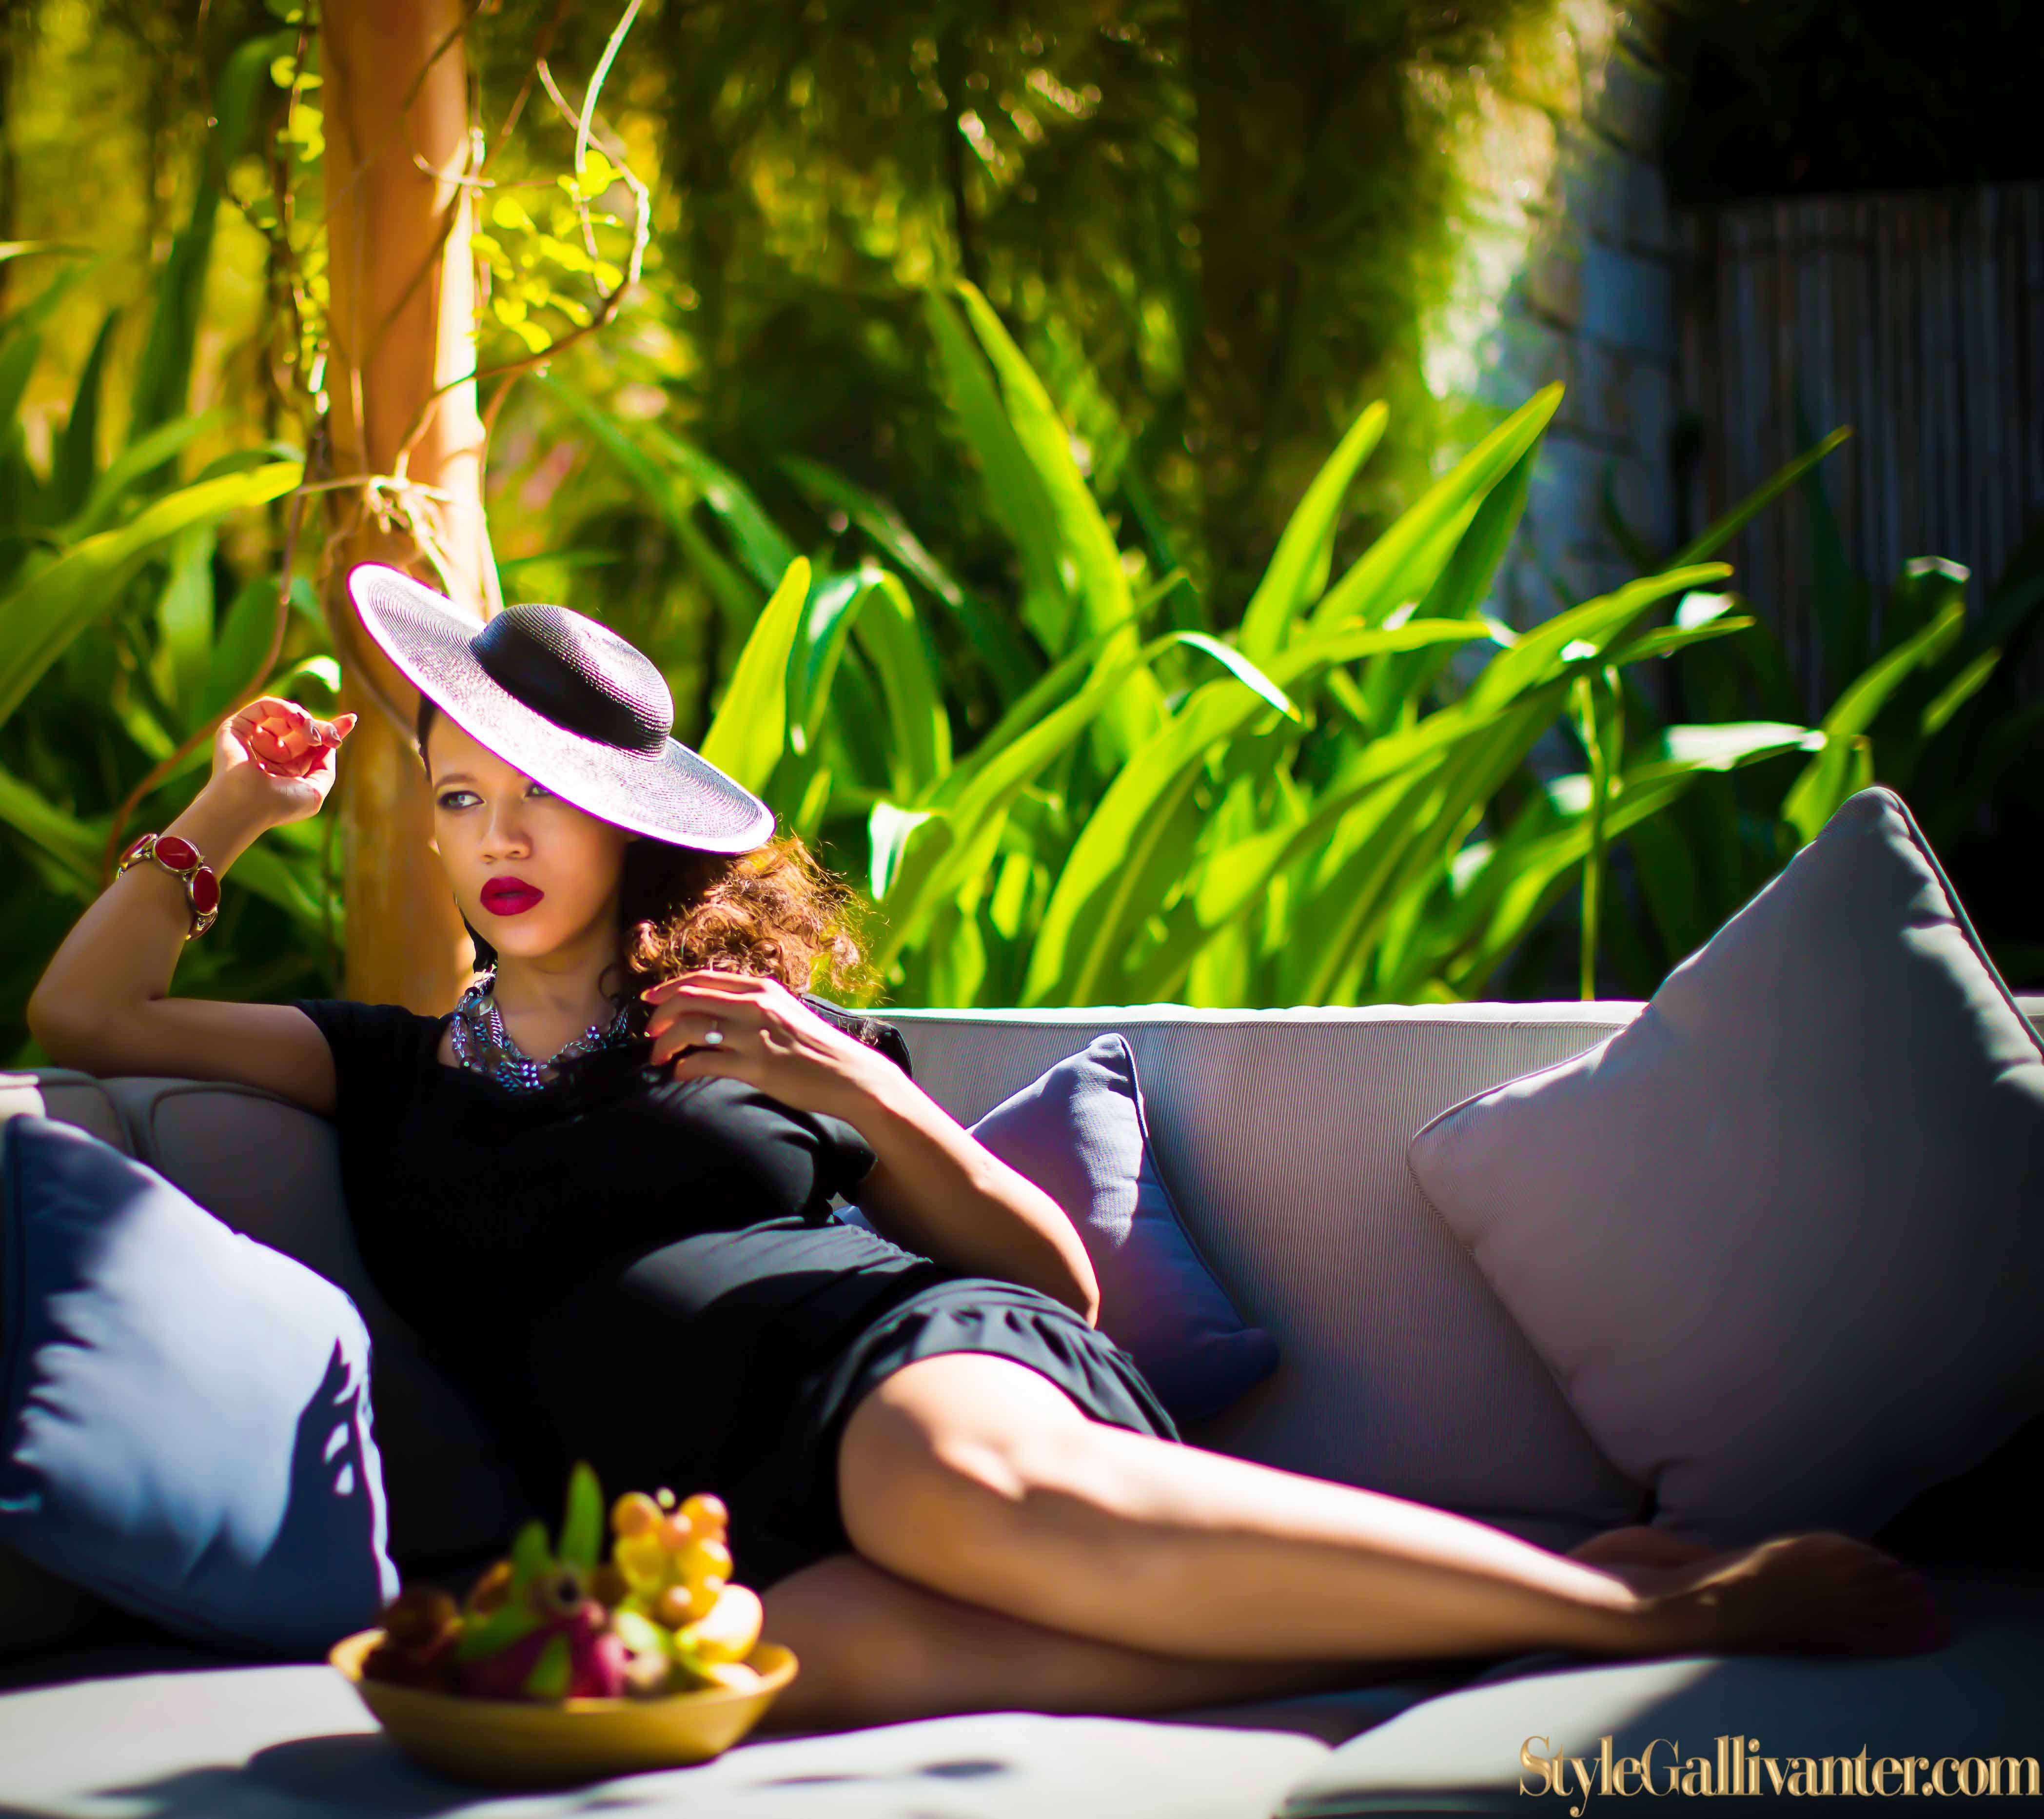 great-fashion-bloggers-melbourne-sydney_stylish-bloggers-melbourne_HIGH-END-BLOGS-MELBOURNE-AUSTRALIA_TOP-EVENT-BLOGGERS-MELBOURNE-AUSTRALIA_TOP-HIGH-FASHION-BLOGS-MELBOURNE-AUSTRALIA_POPULAR-PERSONAL-STYLE-FASHION-BLOGGERS-MELBOURNE-11